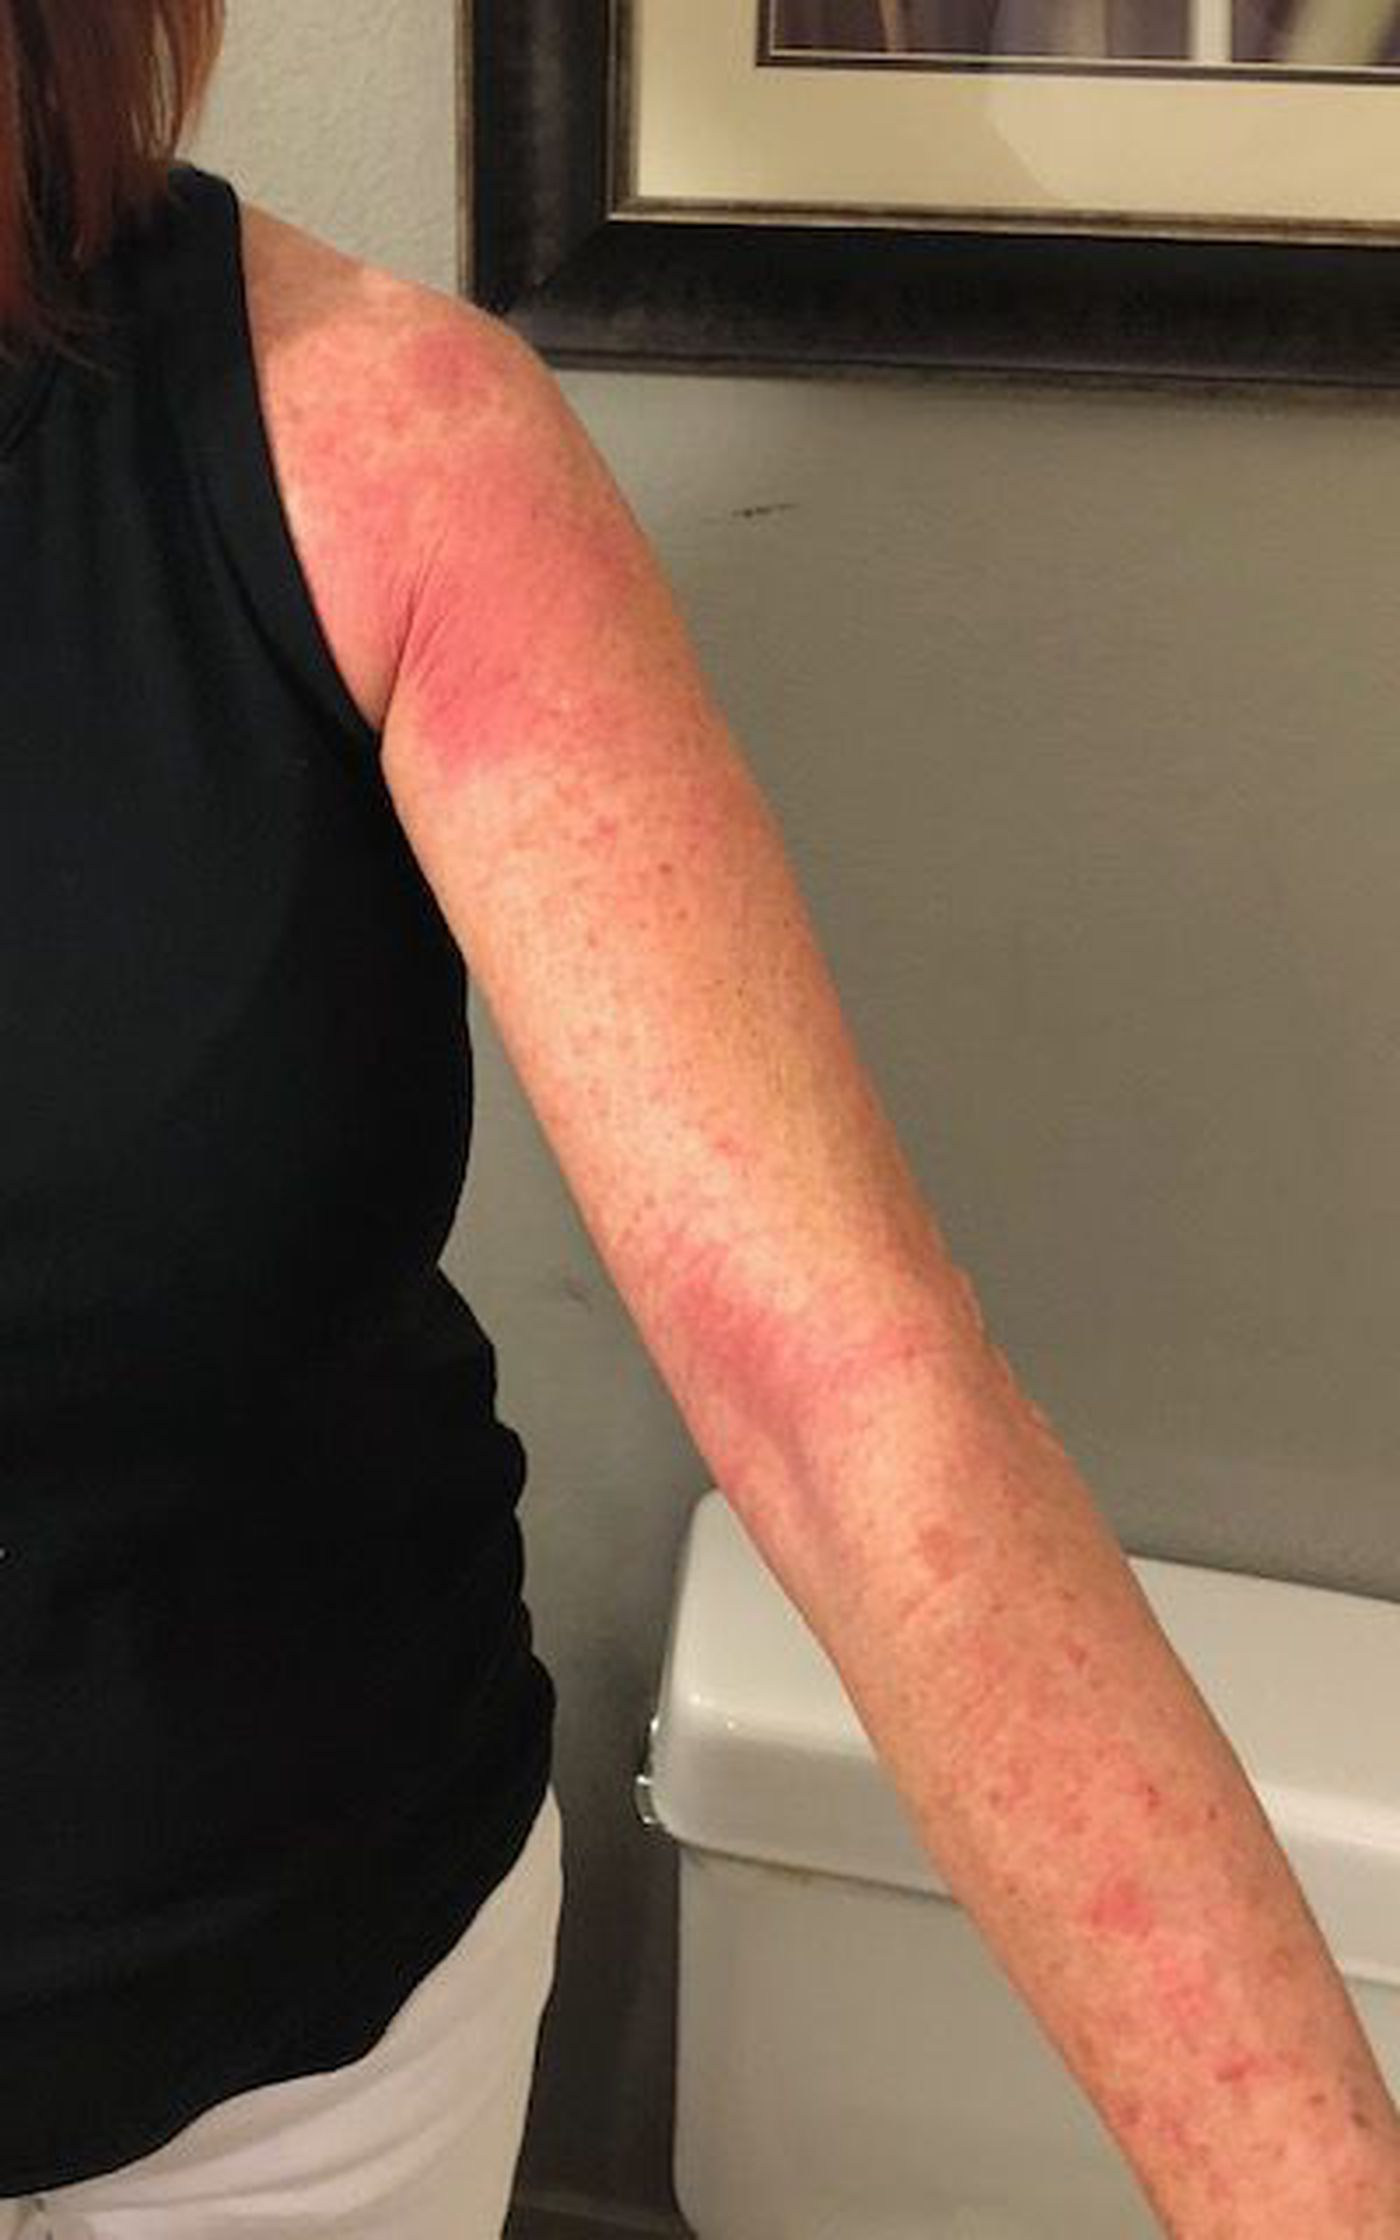 Osborne had a rash from her uniform after a flight in July 2018.